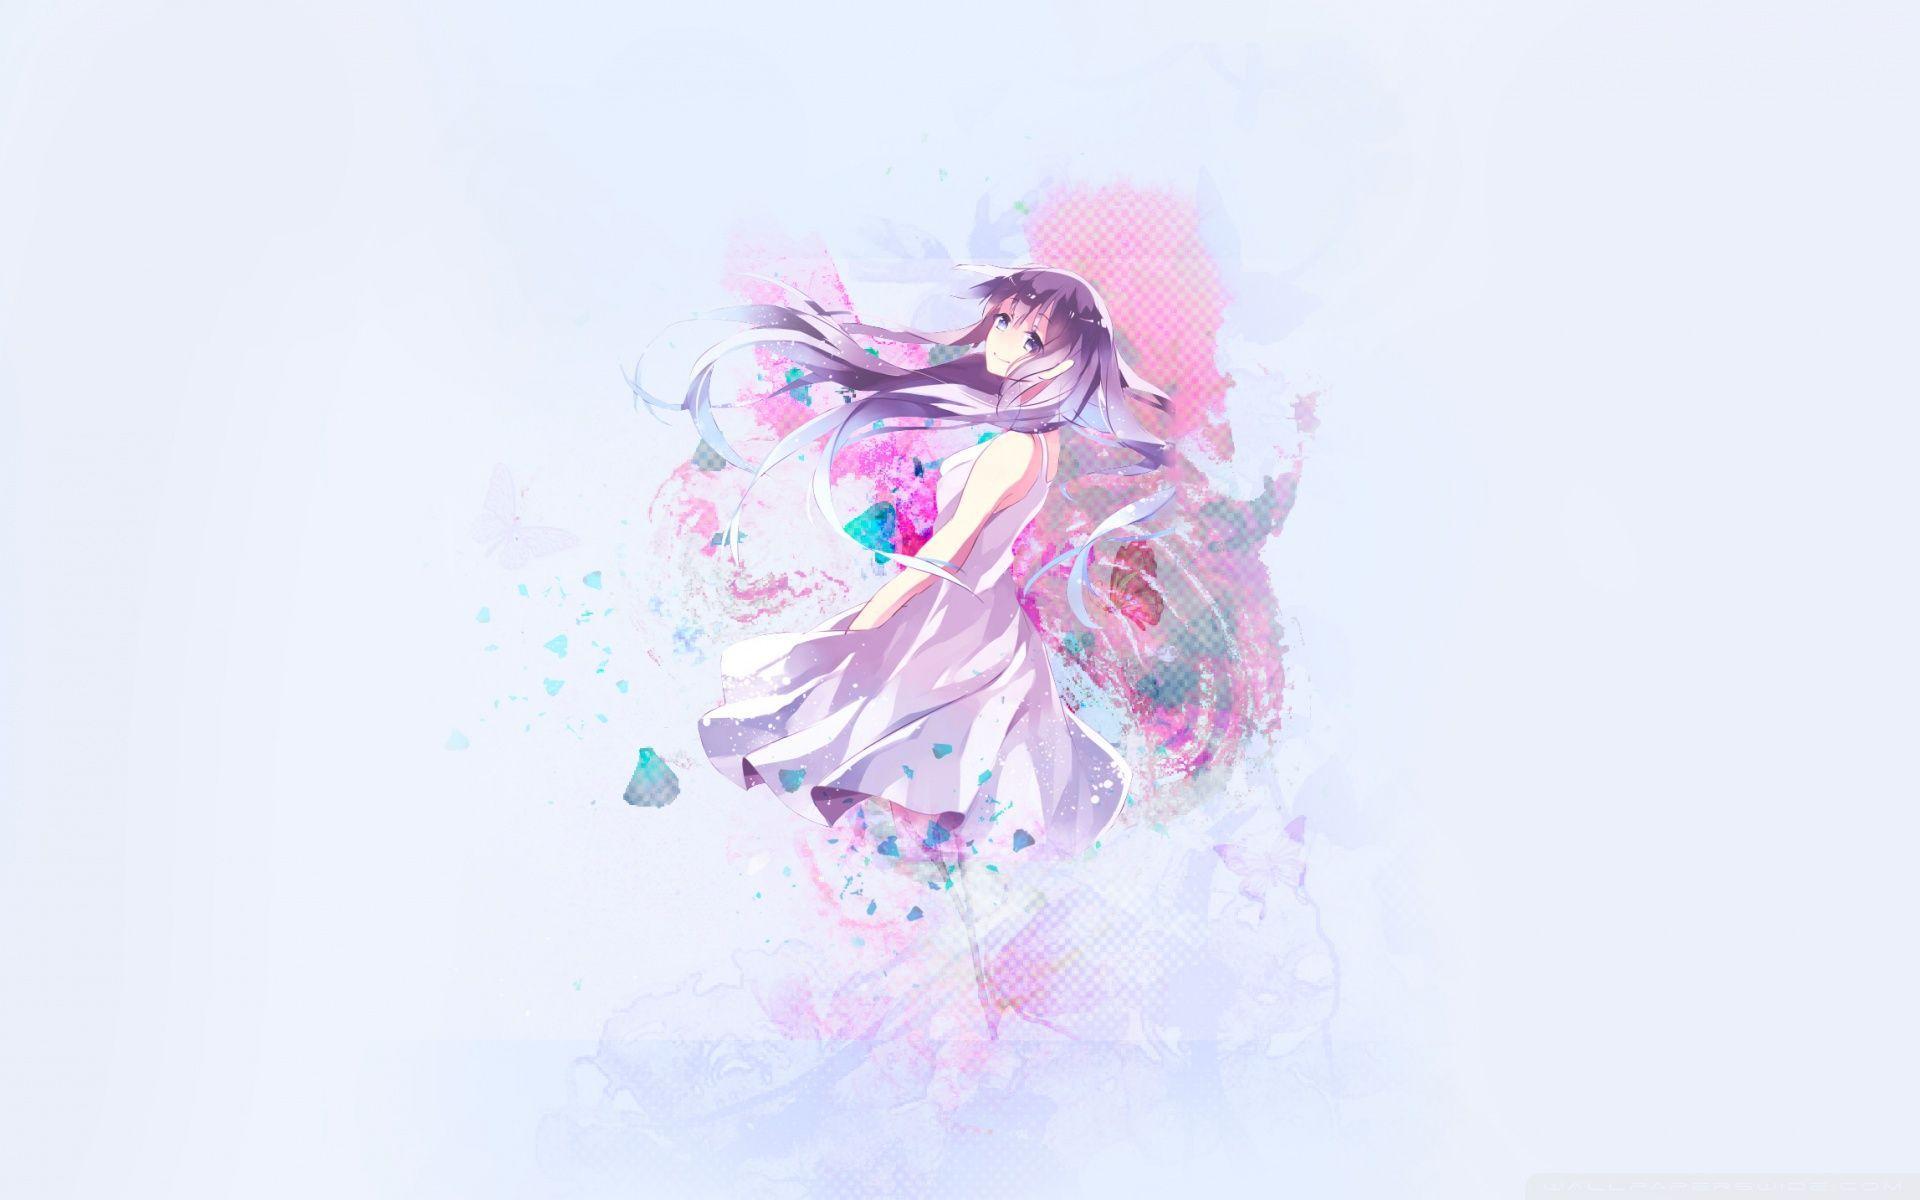 Pastel Mac Wallpapers - Top Free Pastel Mac Backgrounds ...